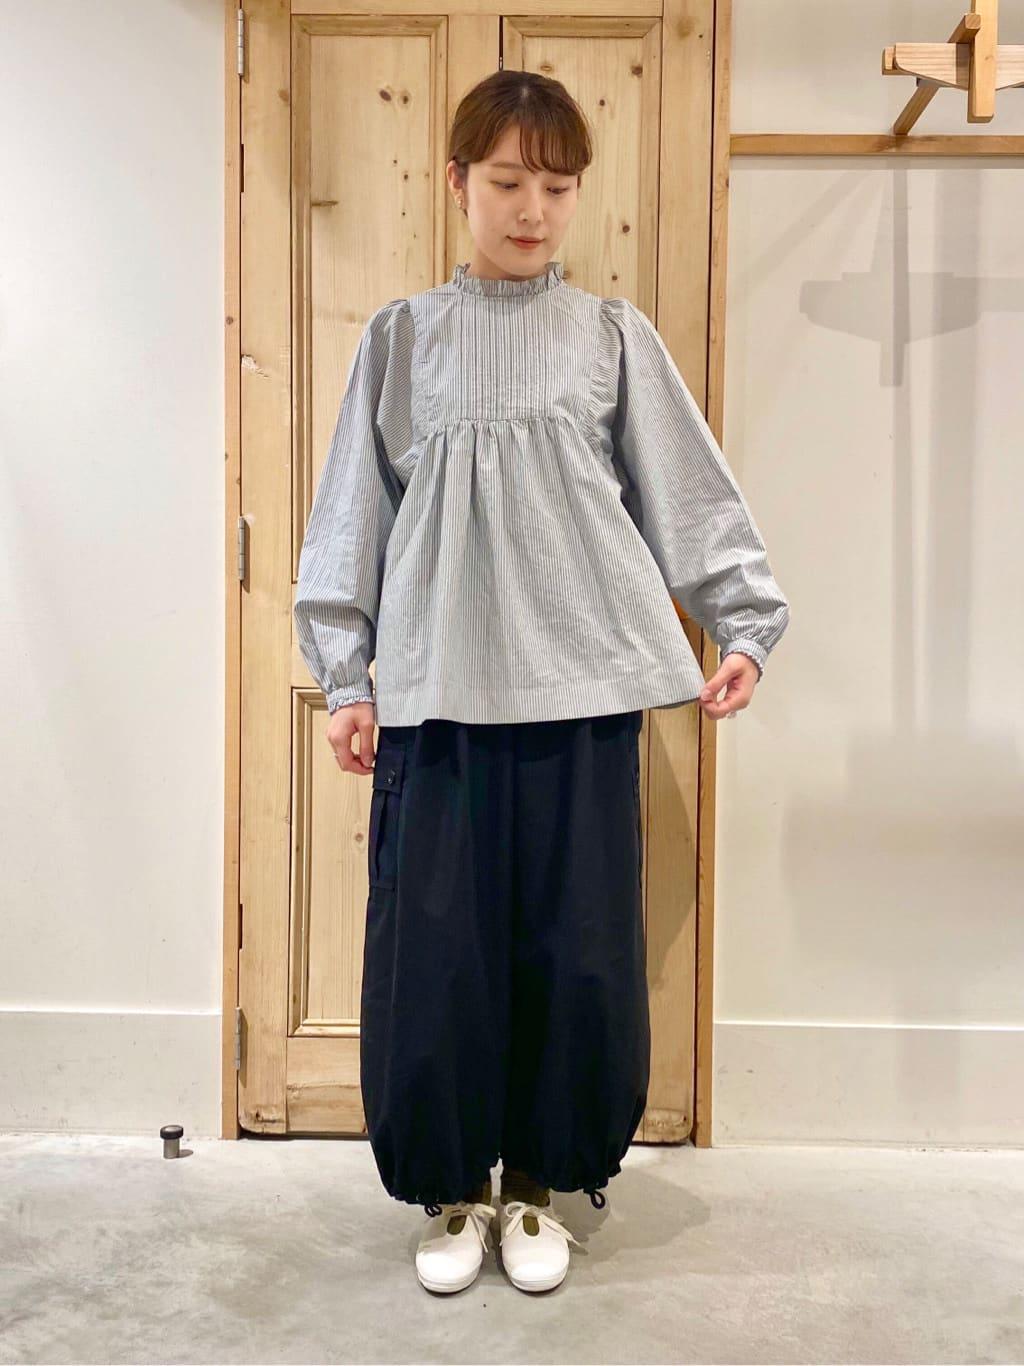 Malle chambre de charme 調布パルコ 身長:160cm 2021.08.26